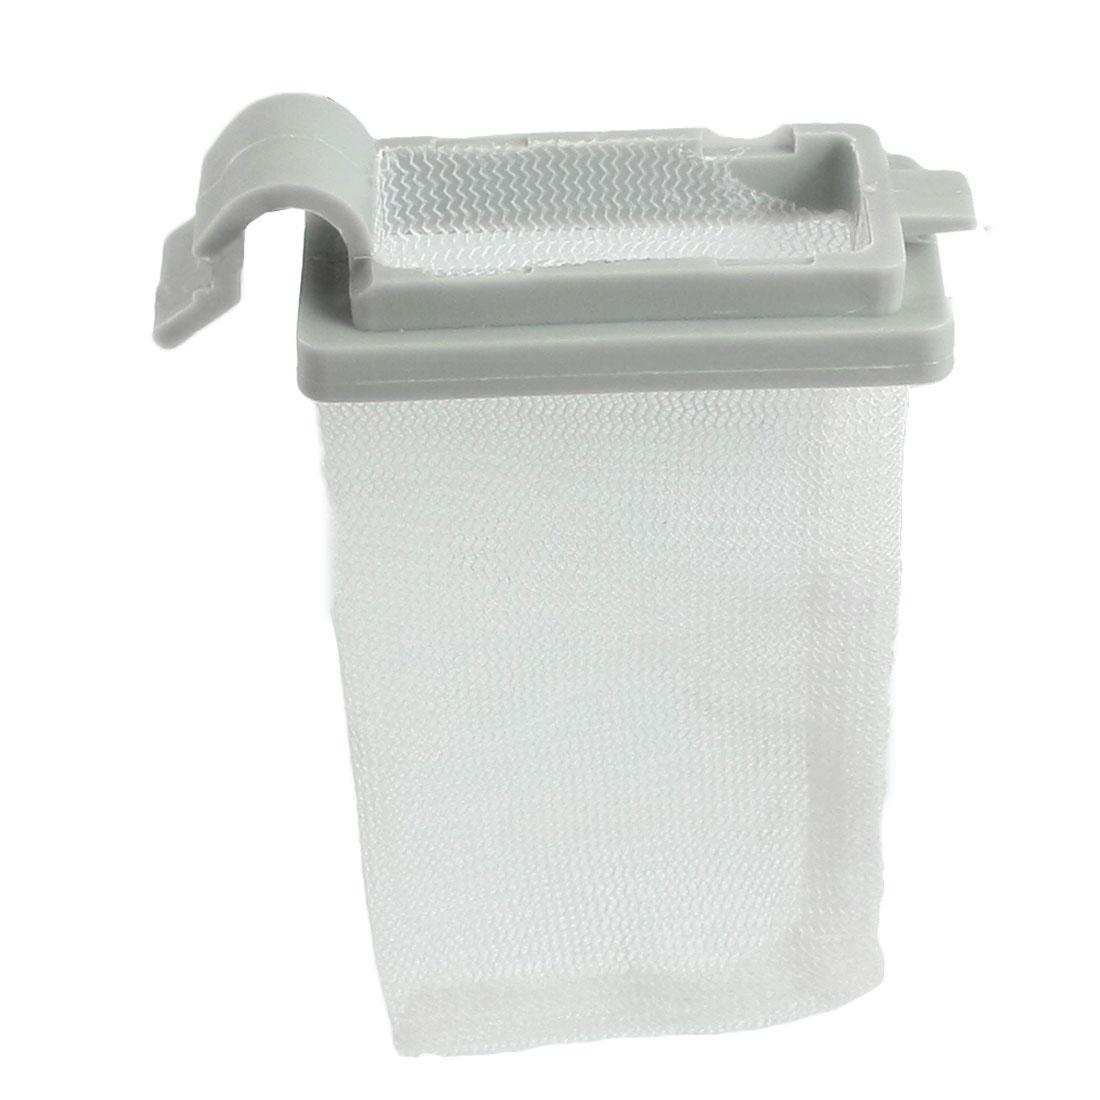 White Nylon Mesh Gray Plastic Frame Washing Machine Filter Bag Replacement